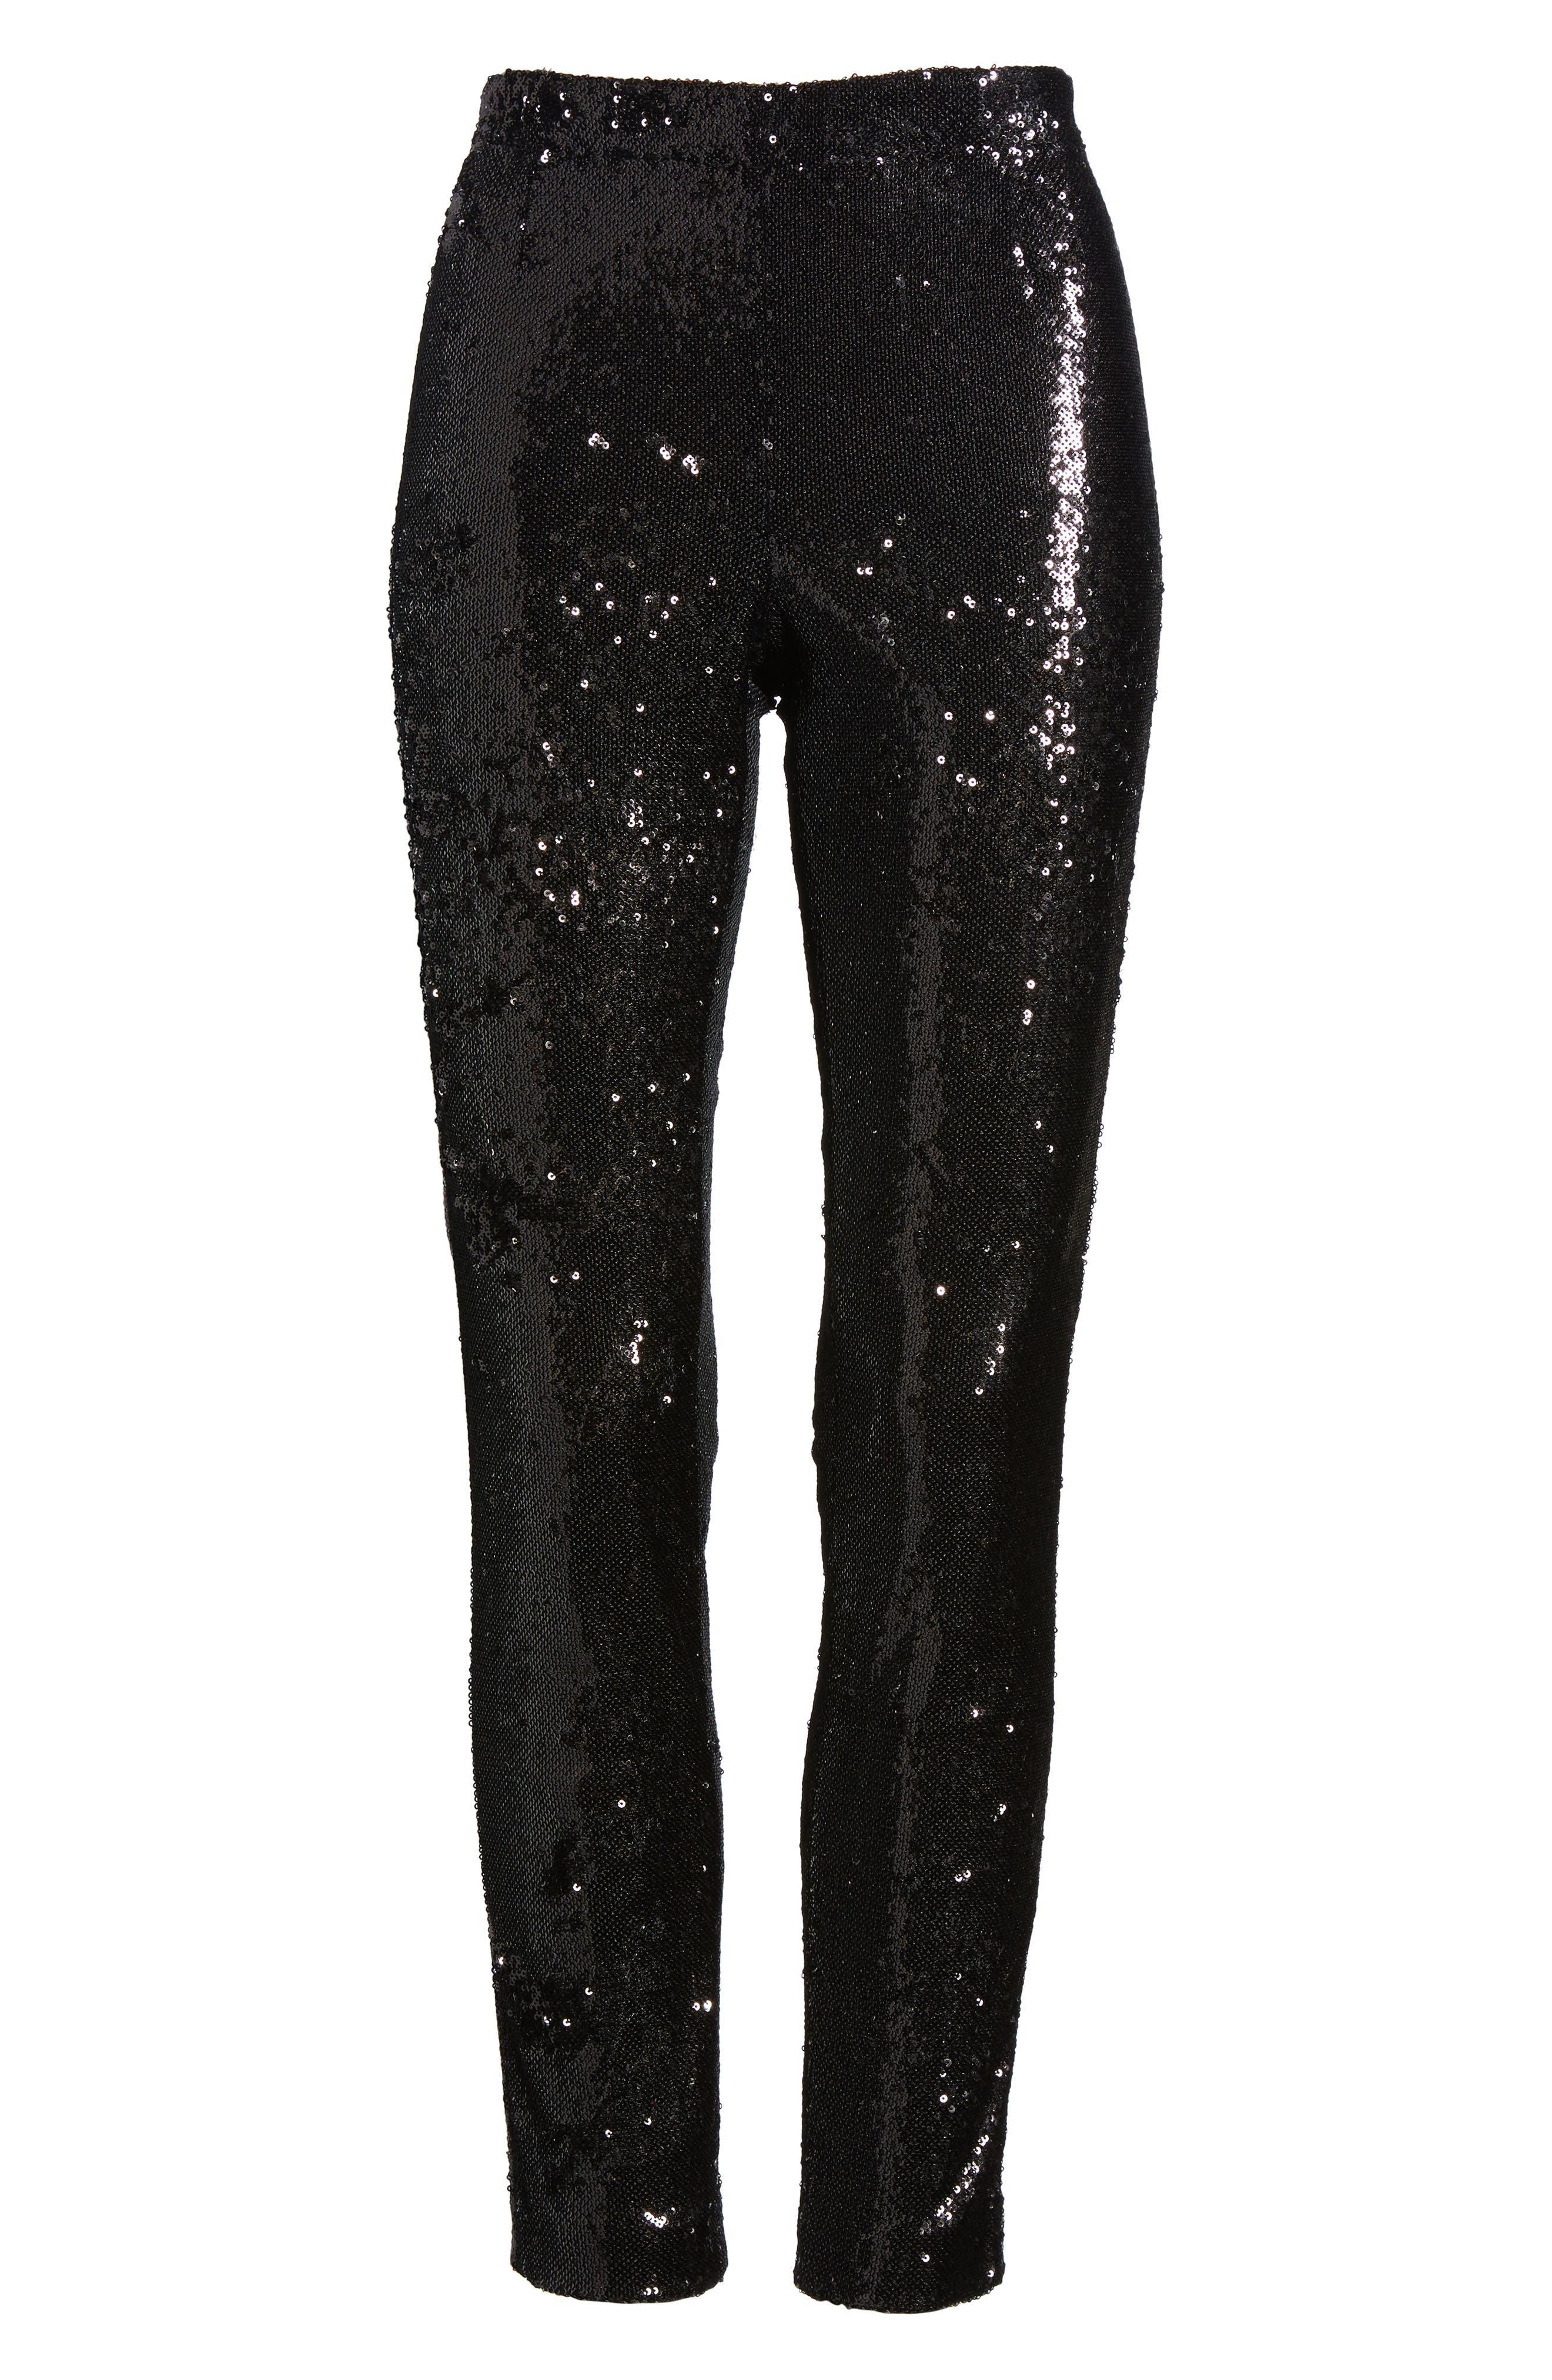 Glendora Sequin Crop Pants,                             Alternate thumbnail 6, color,                             Black